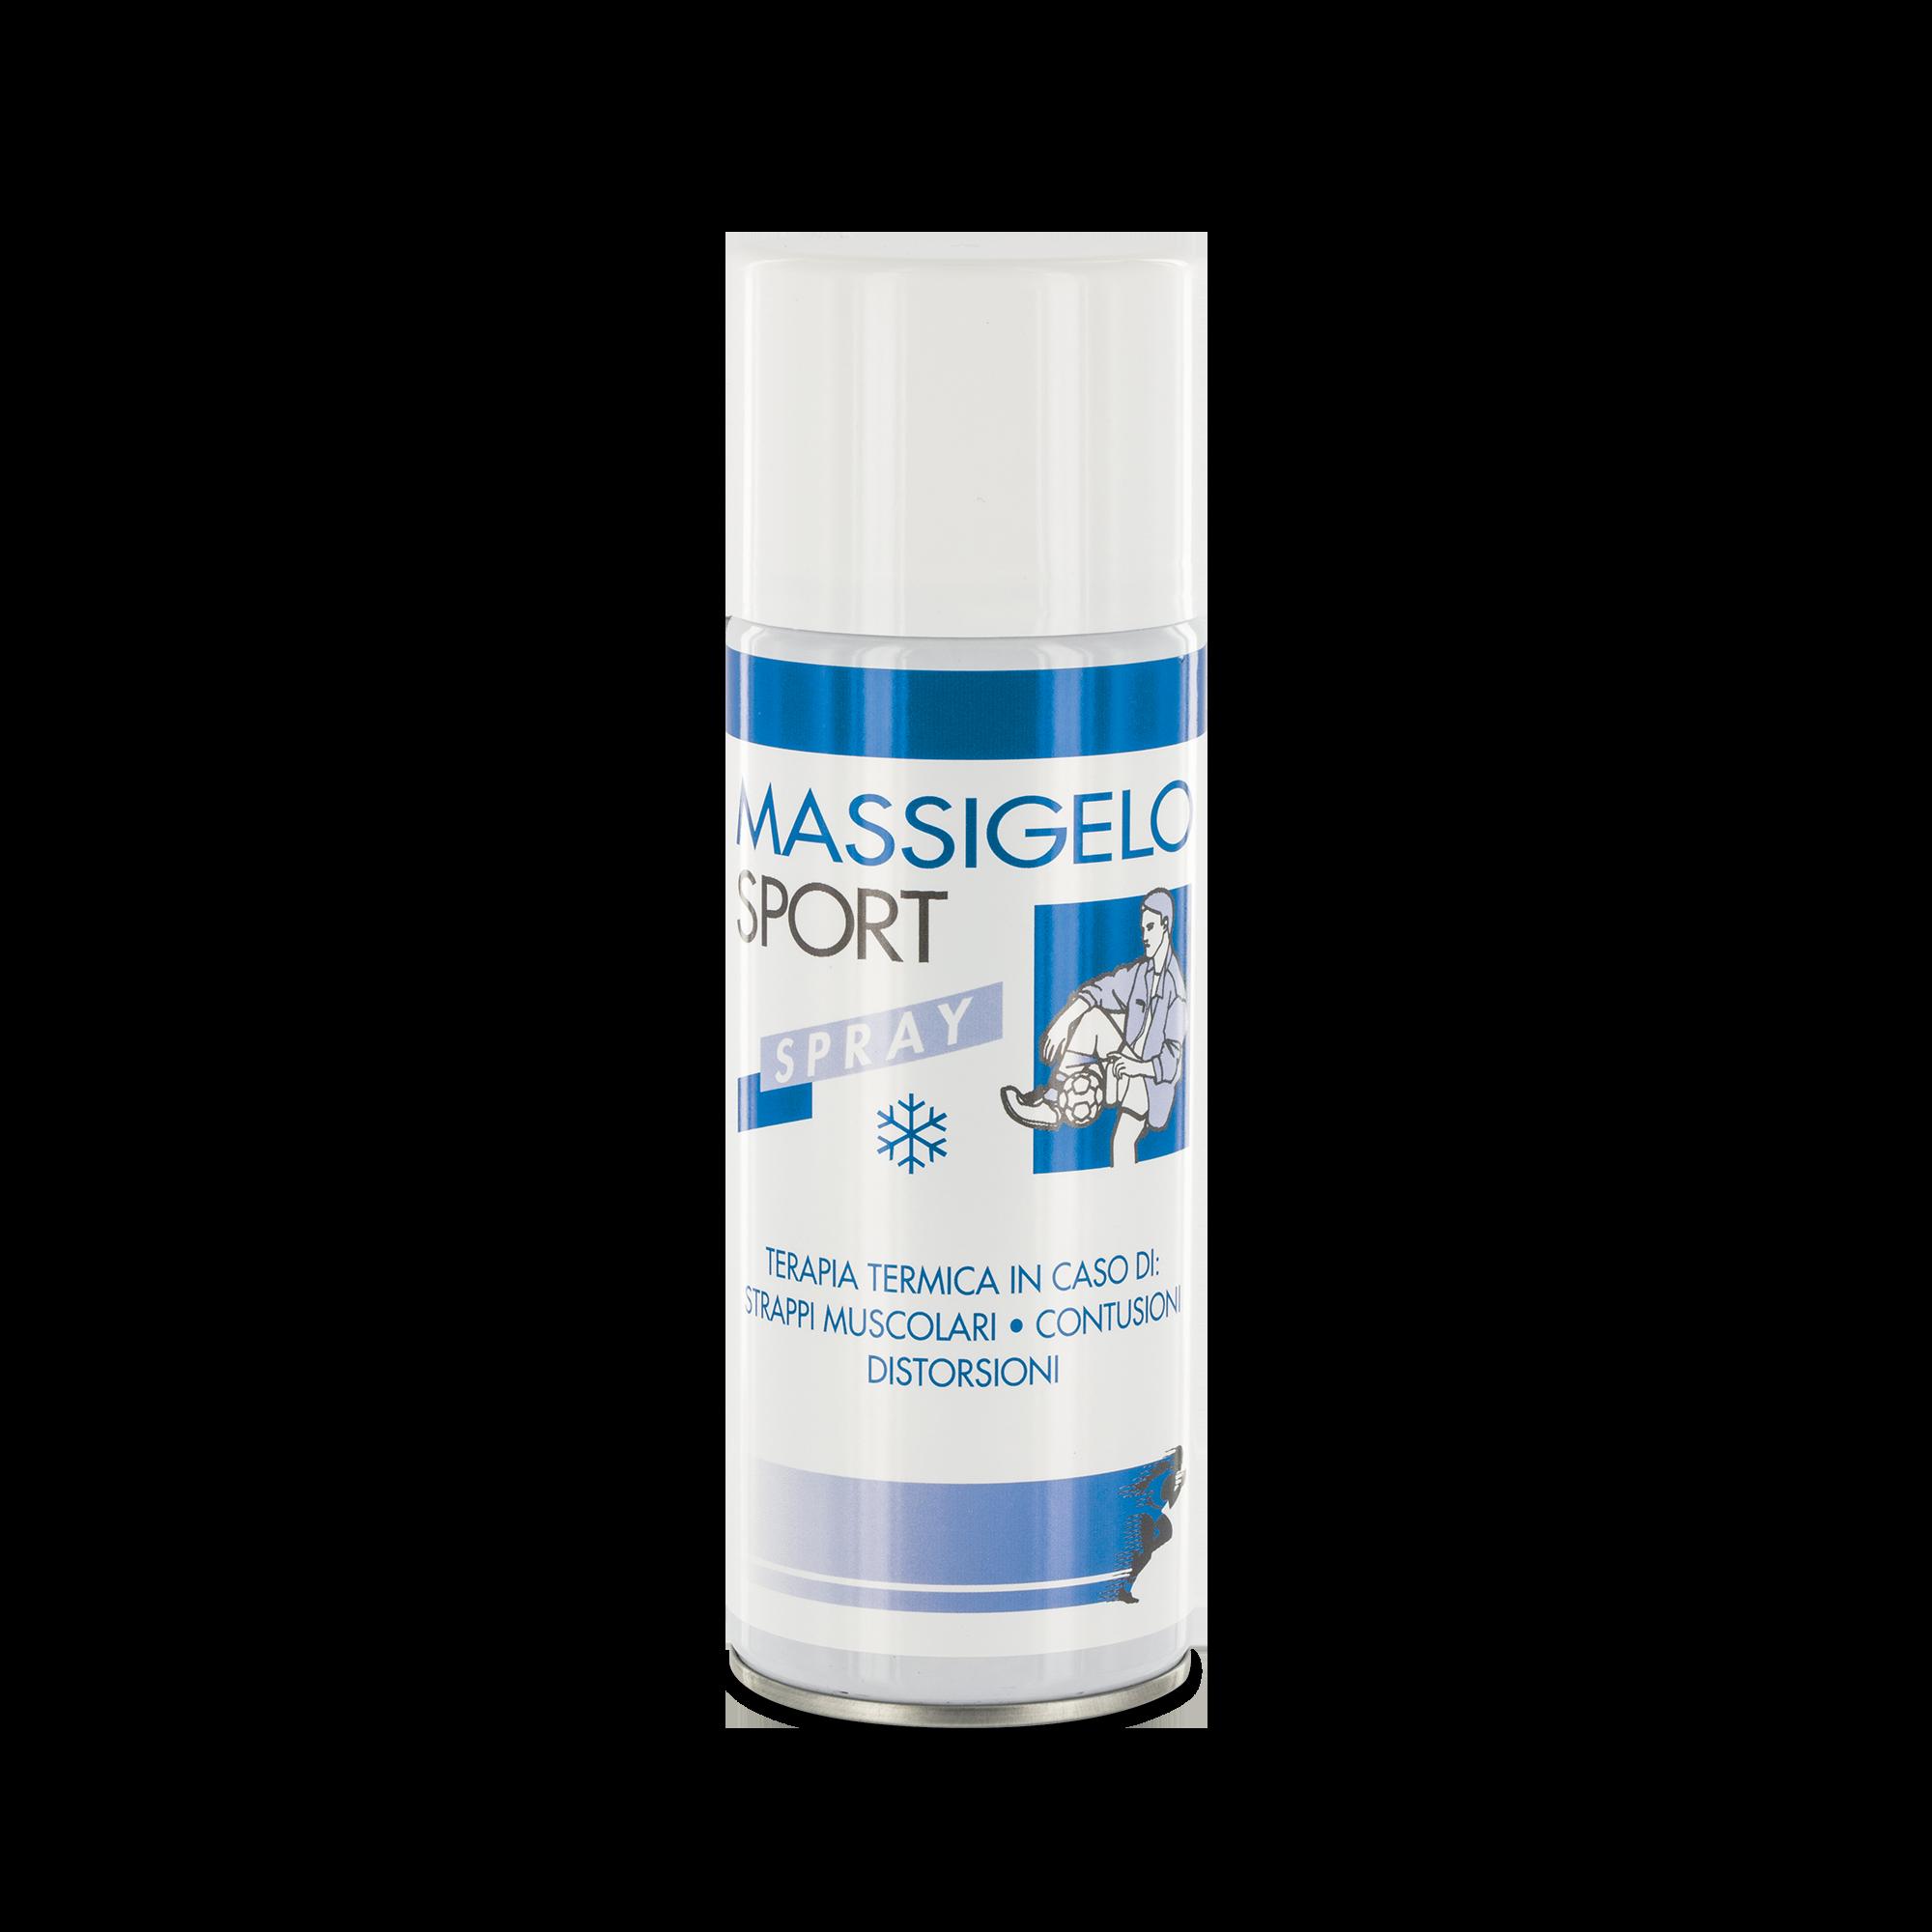 Massigen Massigelo Sport Spray Flacone Spray 400 Ml.